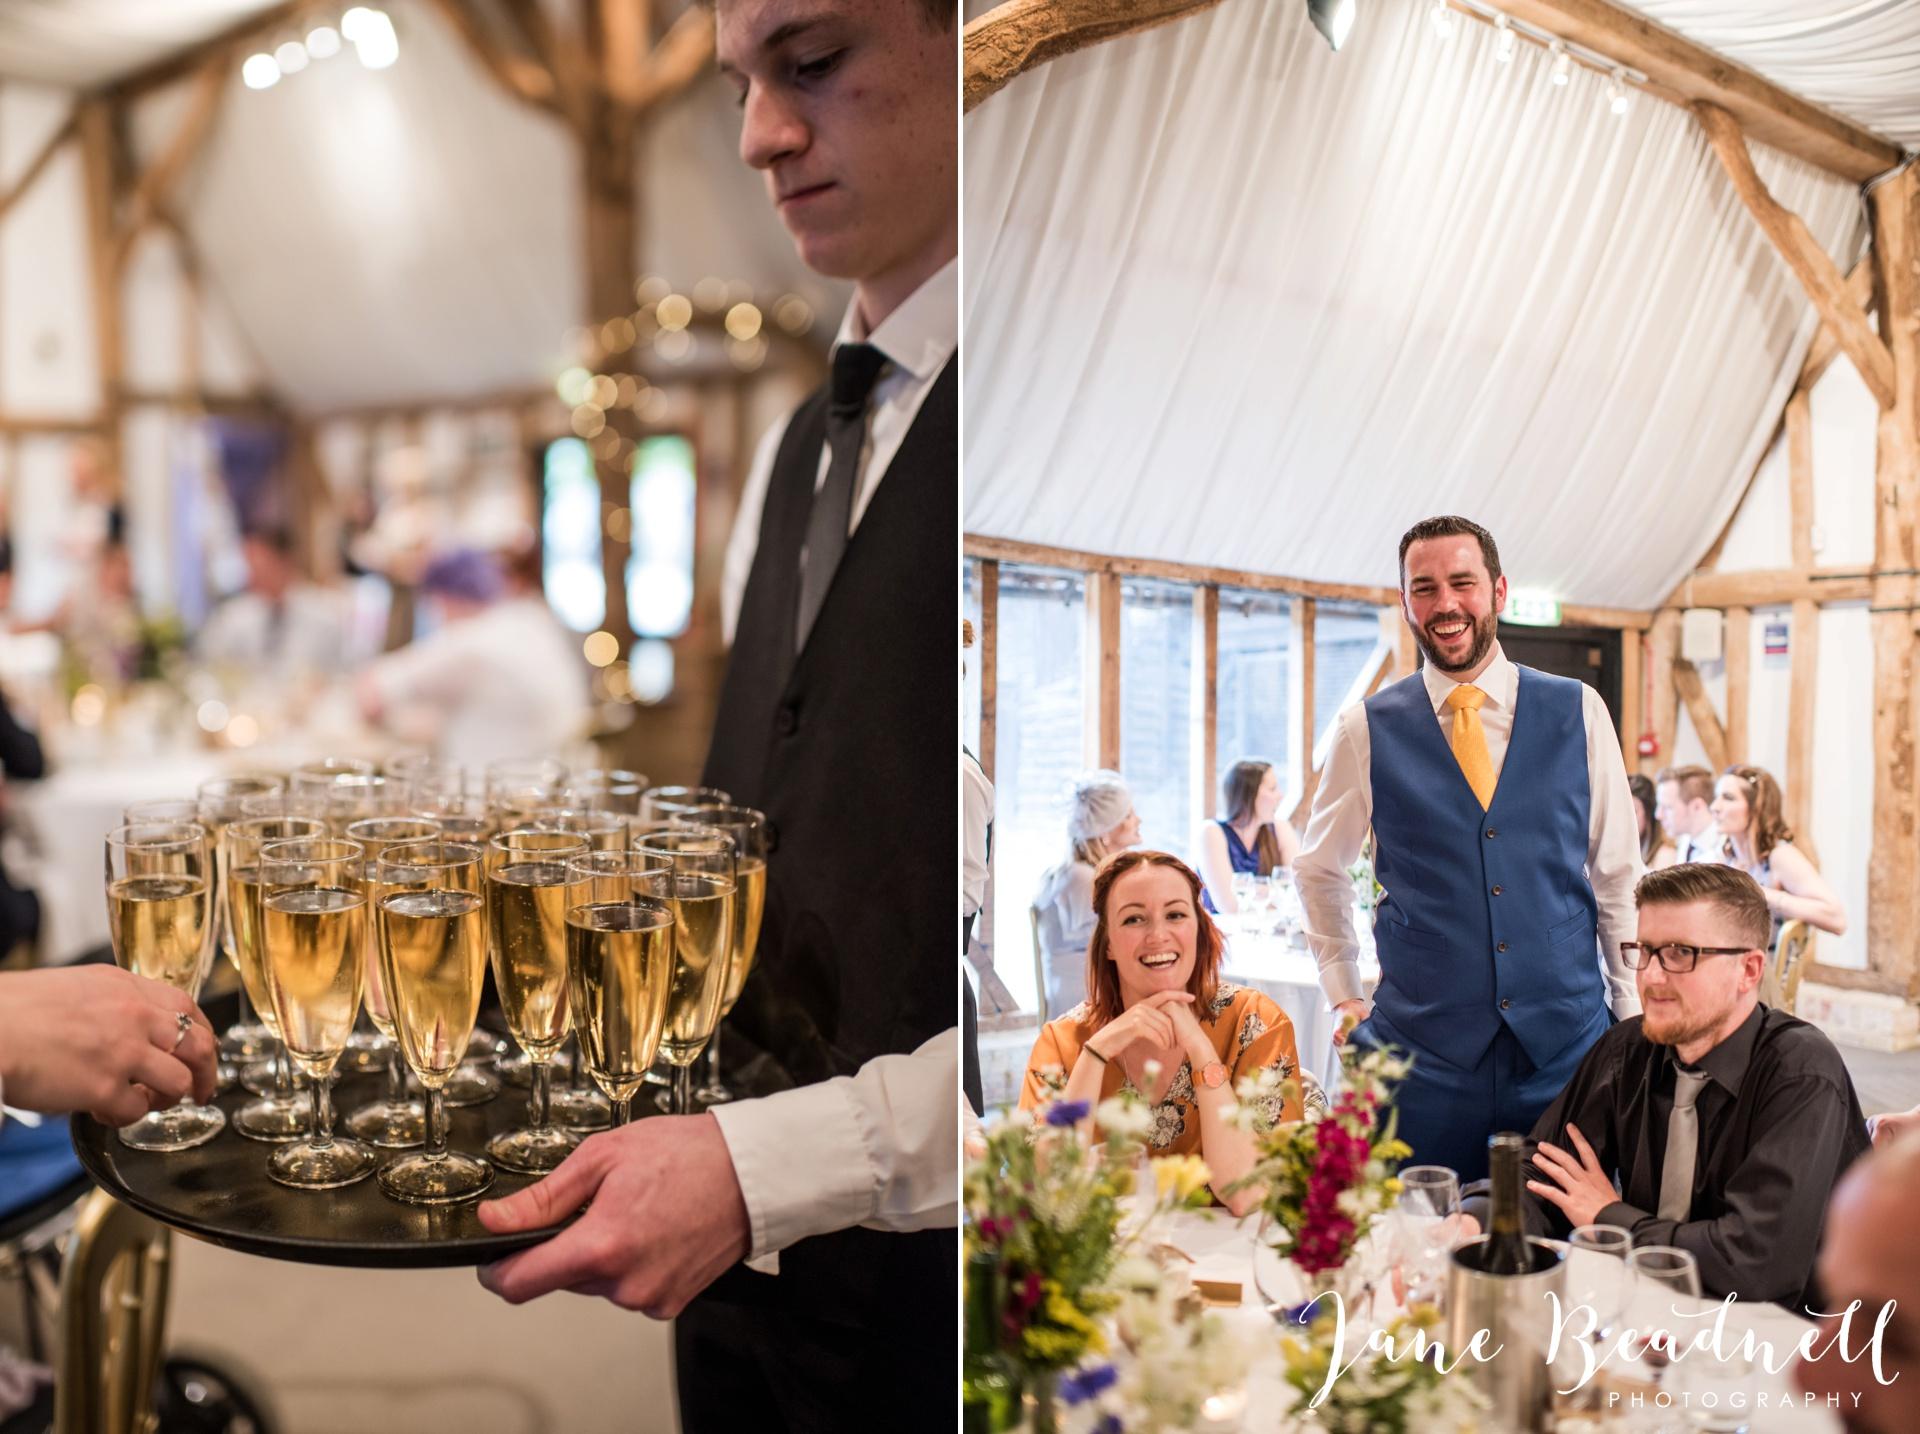 South Farm Wedding photography Hertfordshire by Jane Beadnell Photography fine art wedding photographer_0187